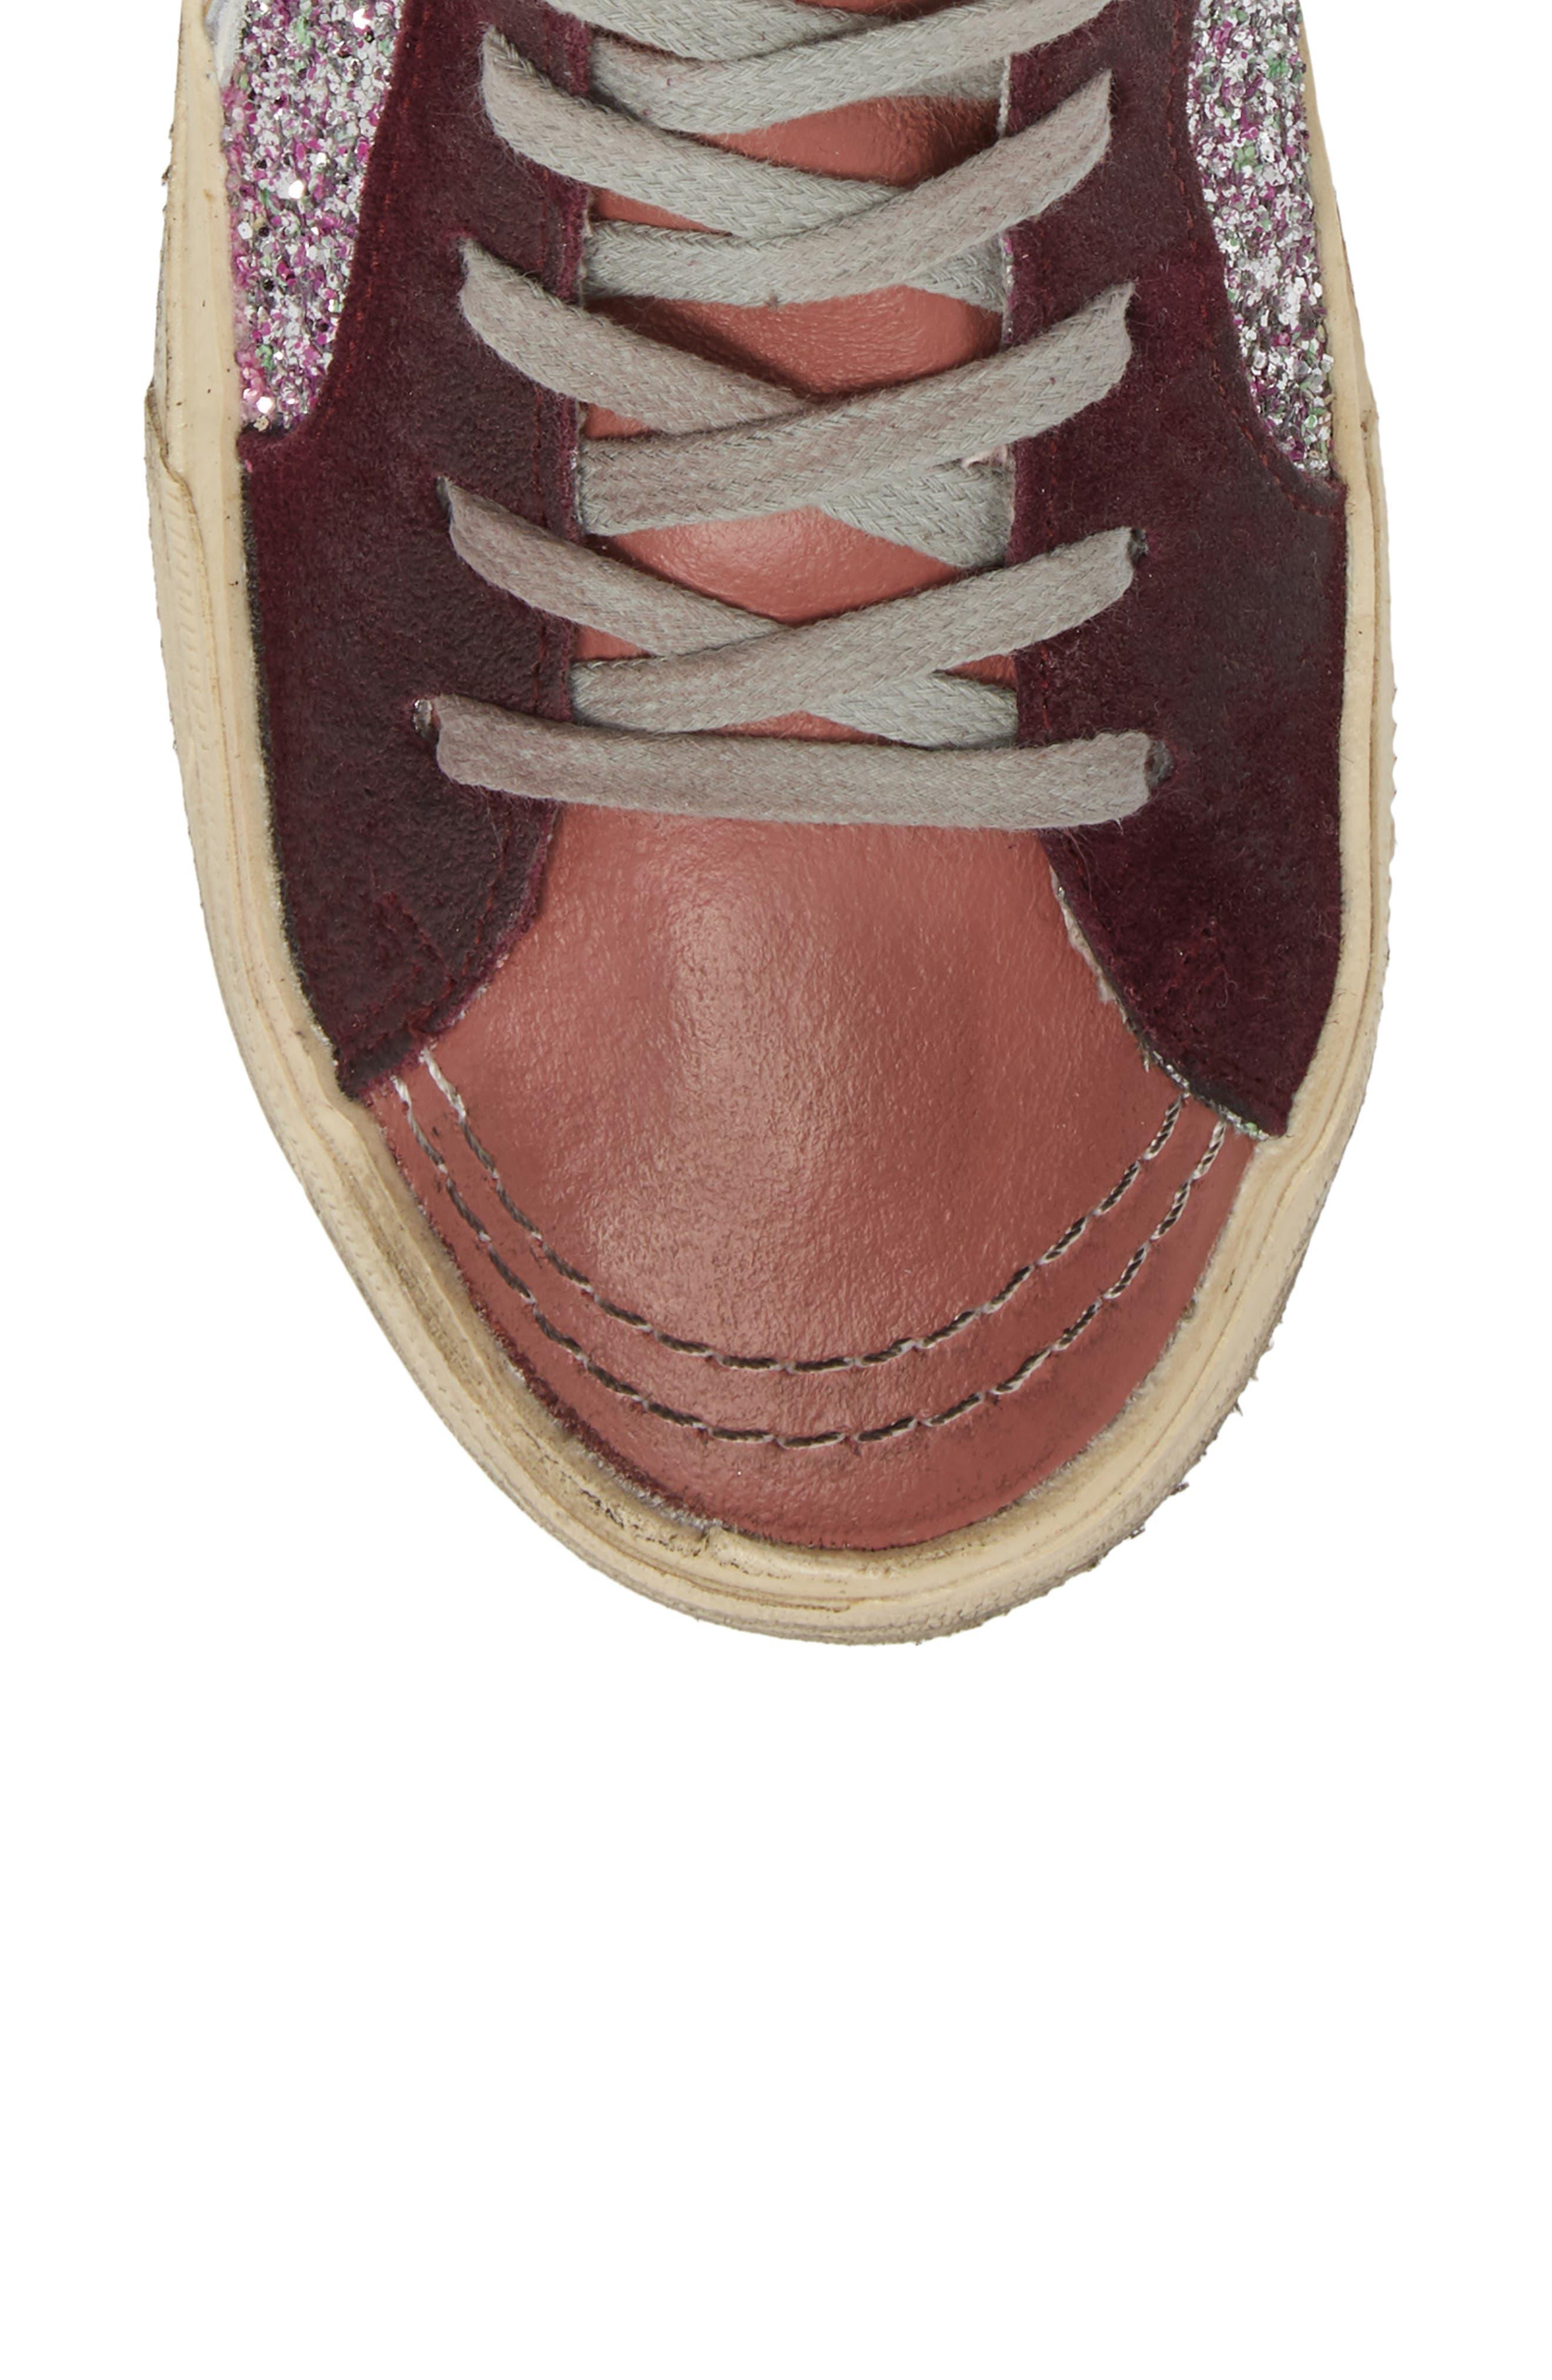 Slide High Top Sneaker,                             Alternate thumbnail 5, color,                             Bordeaux / Pink/ Gold